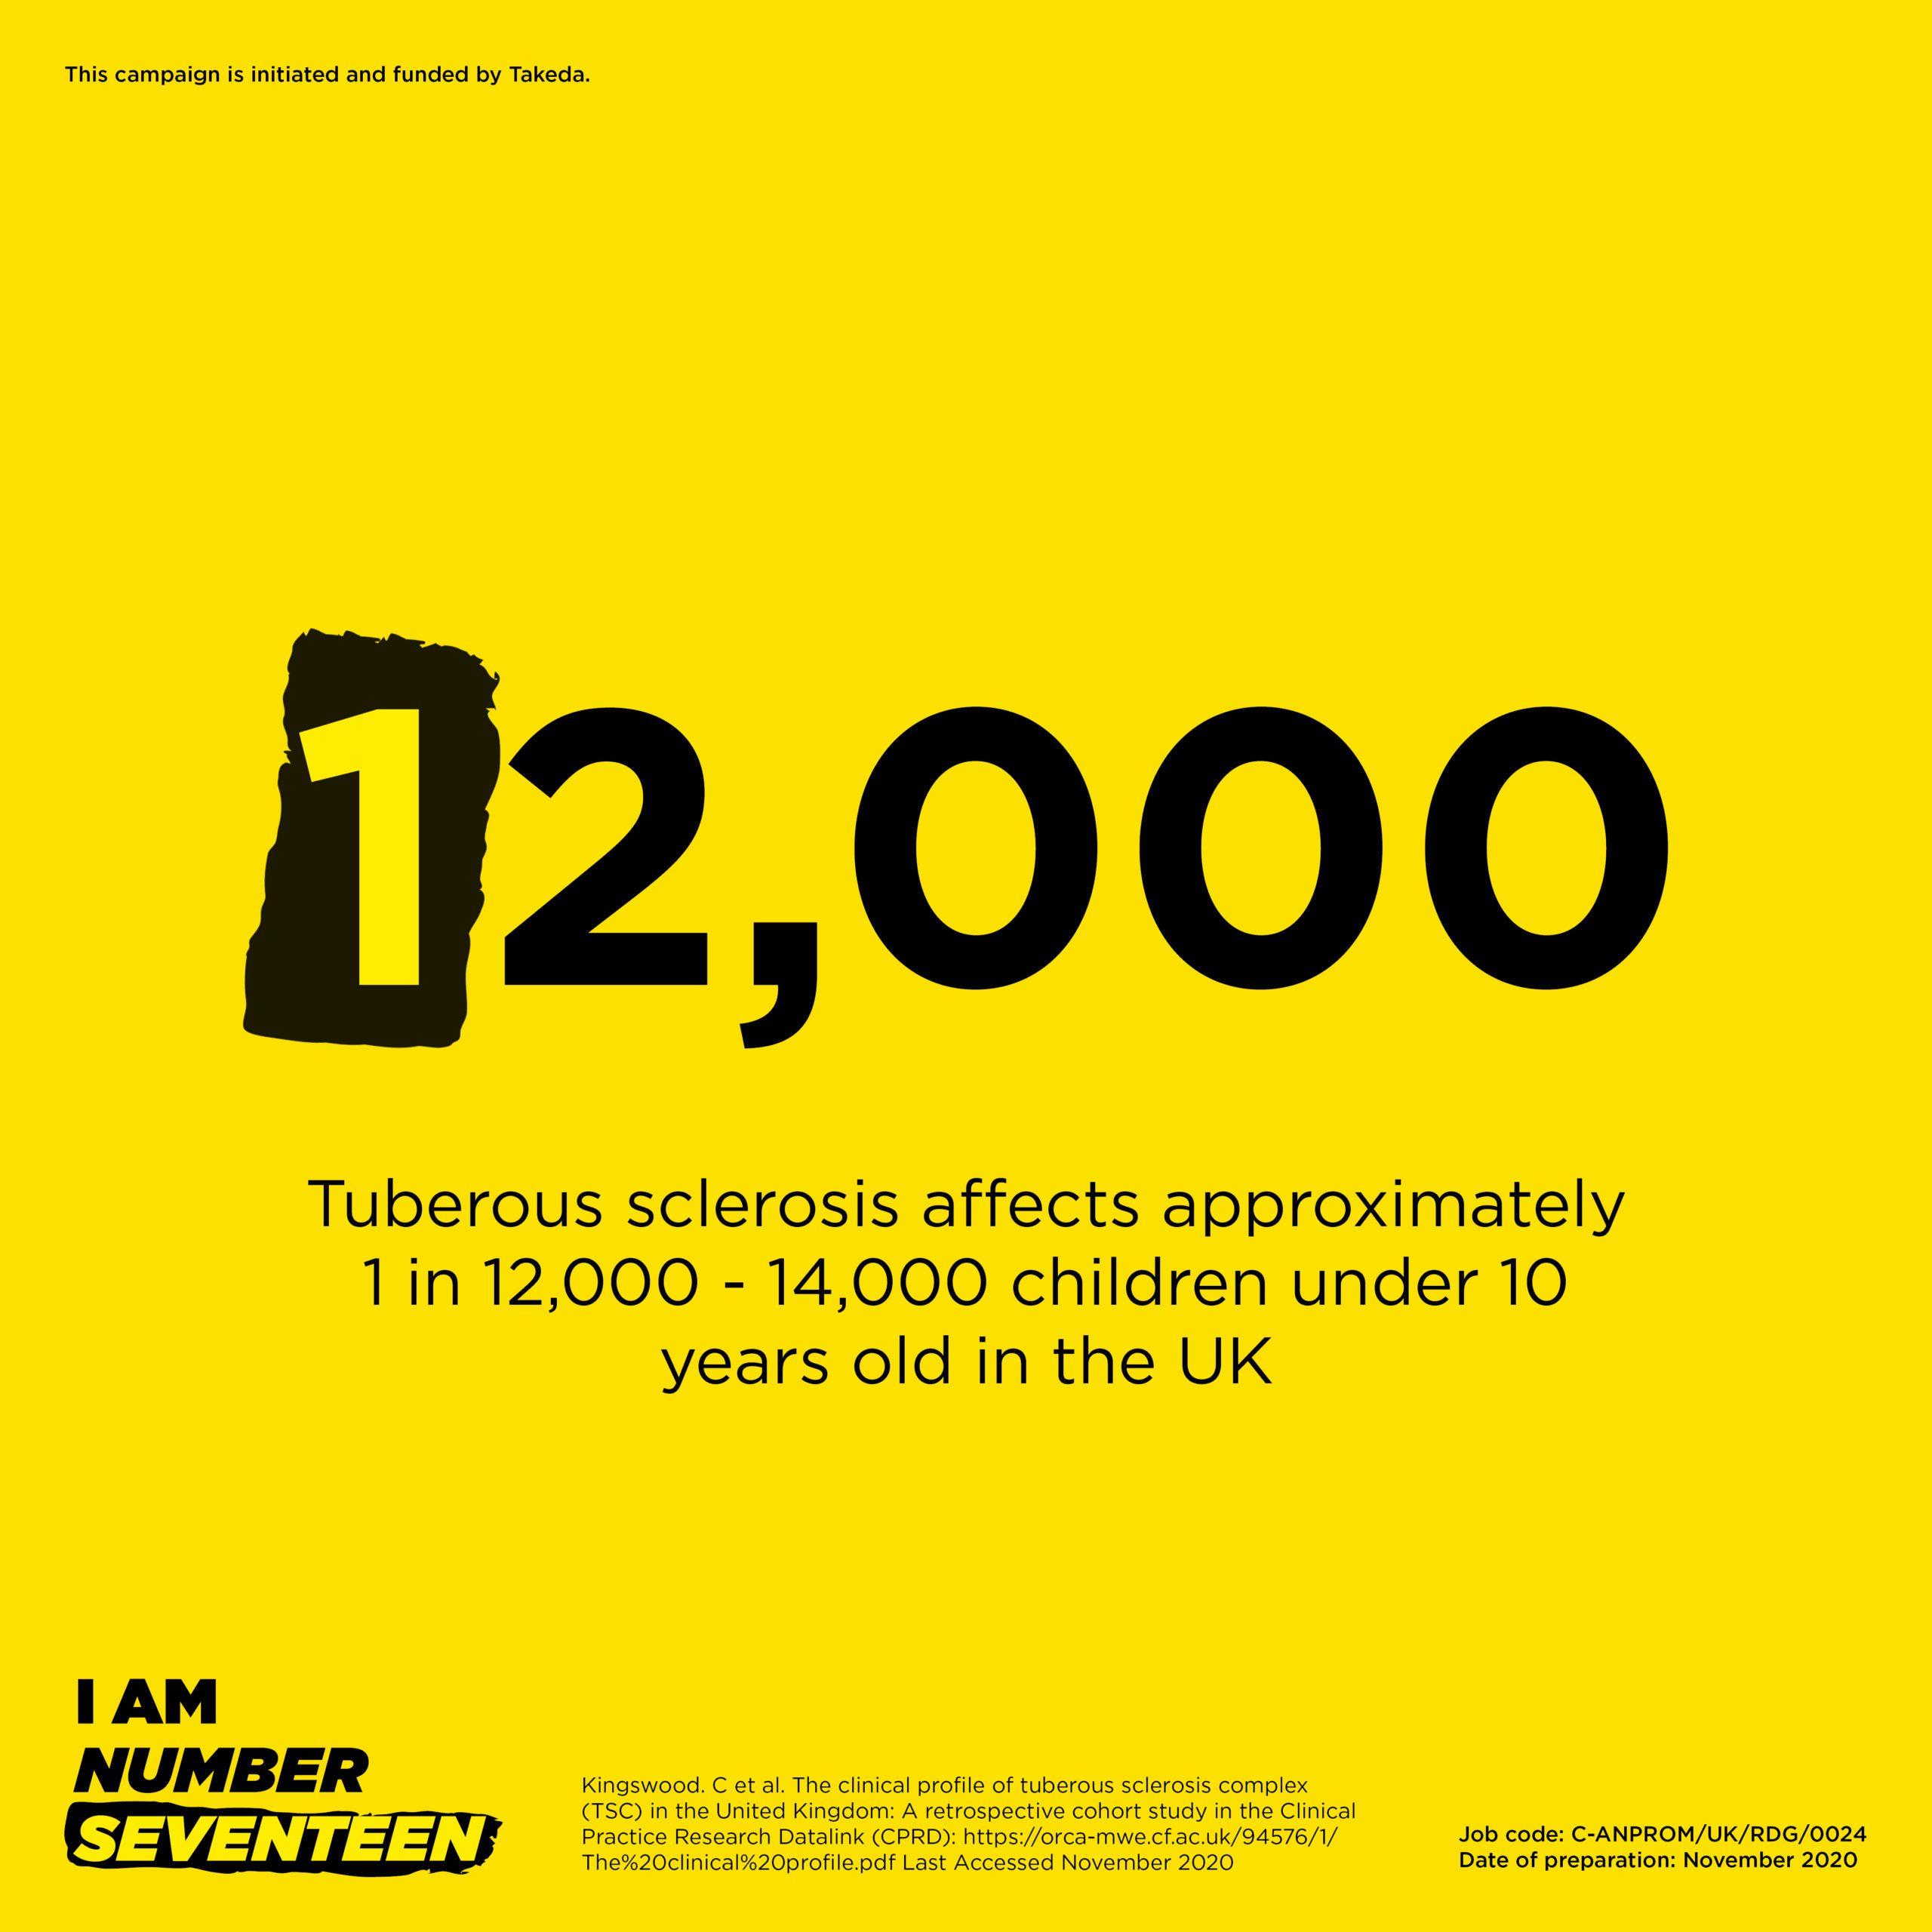 Lucinda - 1 in 12-14,000 statistic graphic